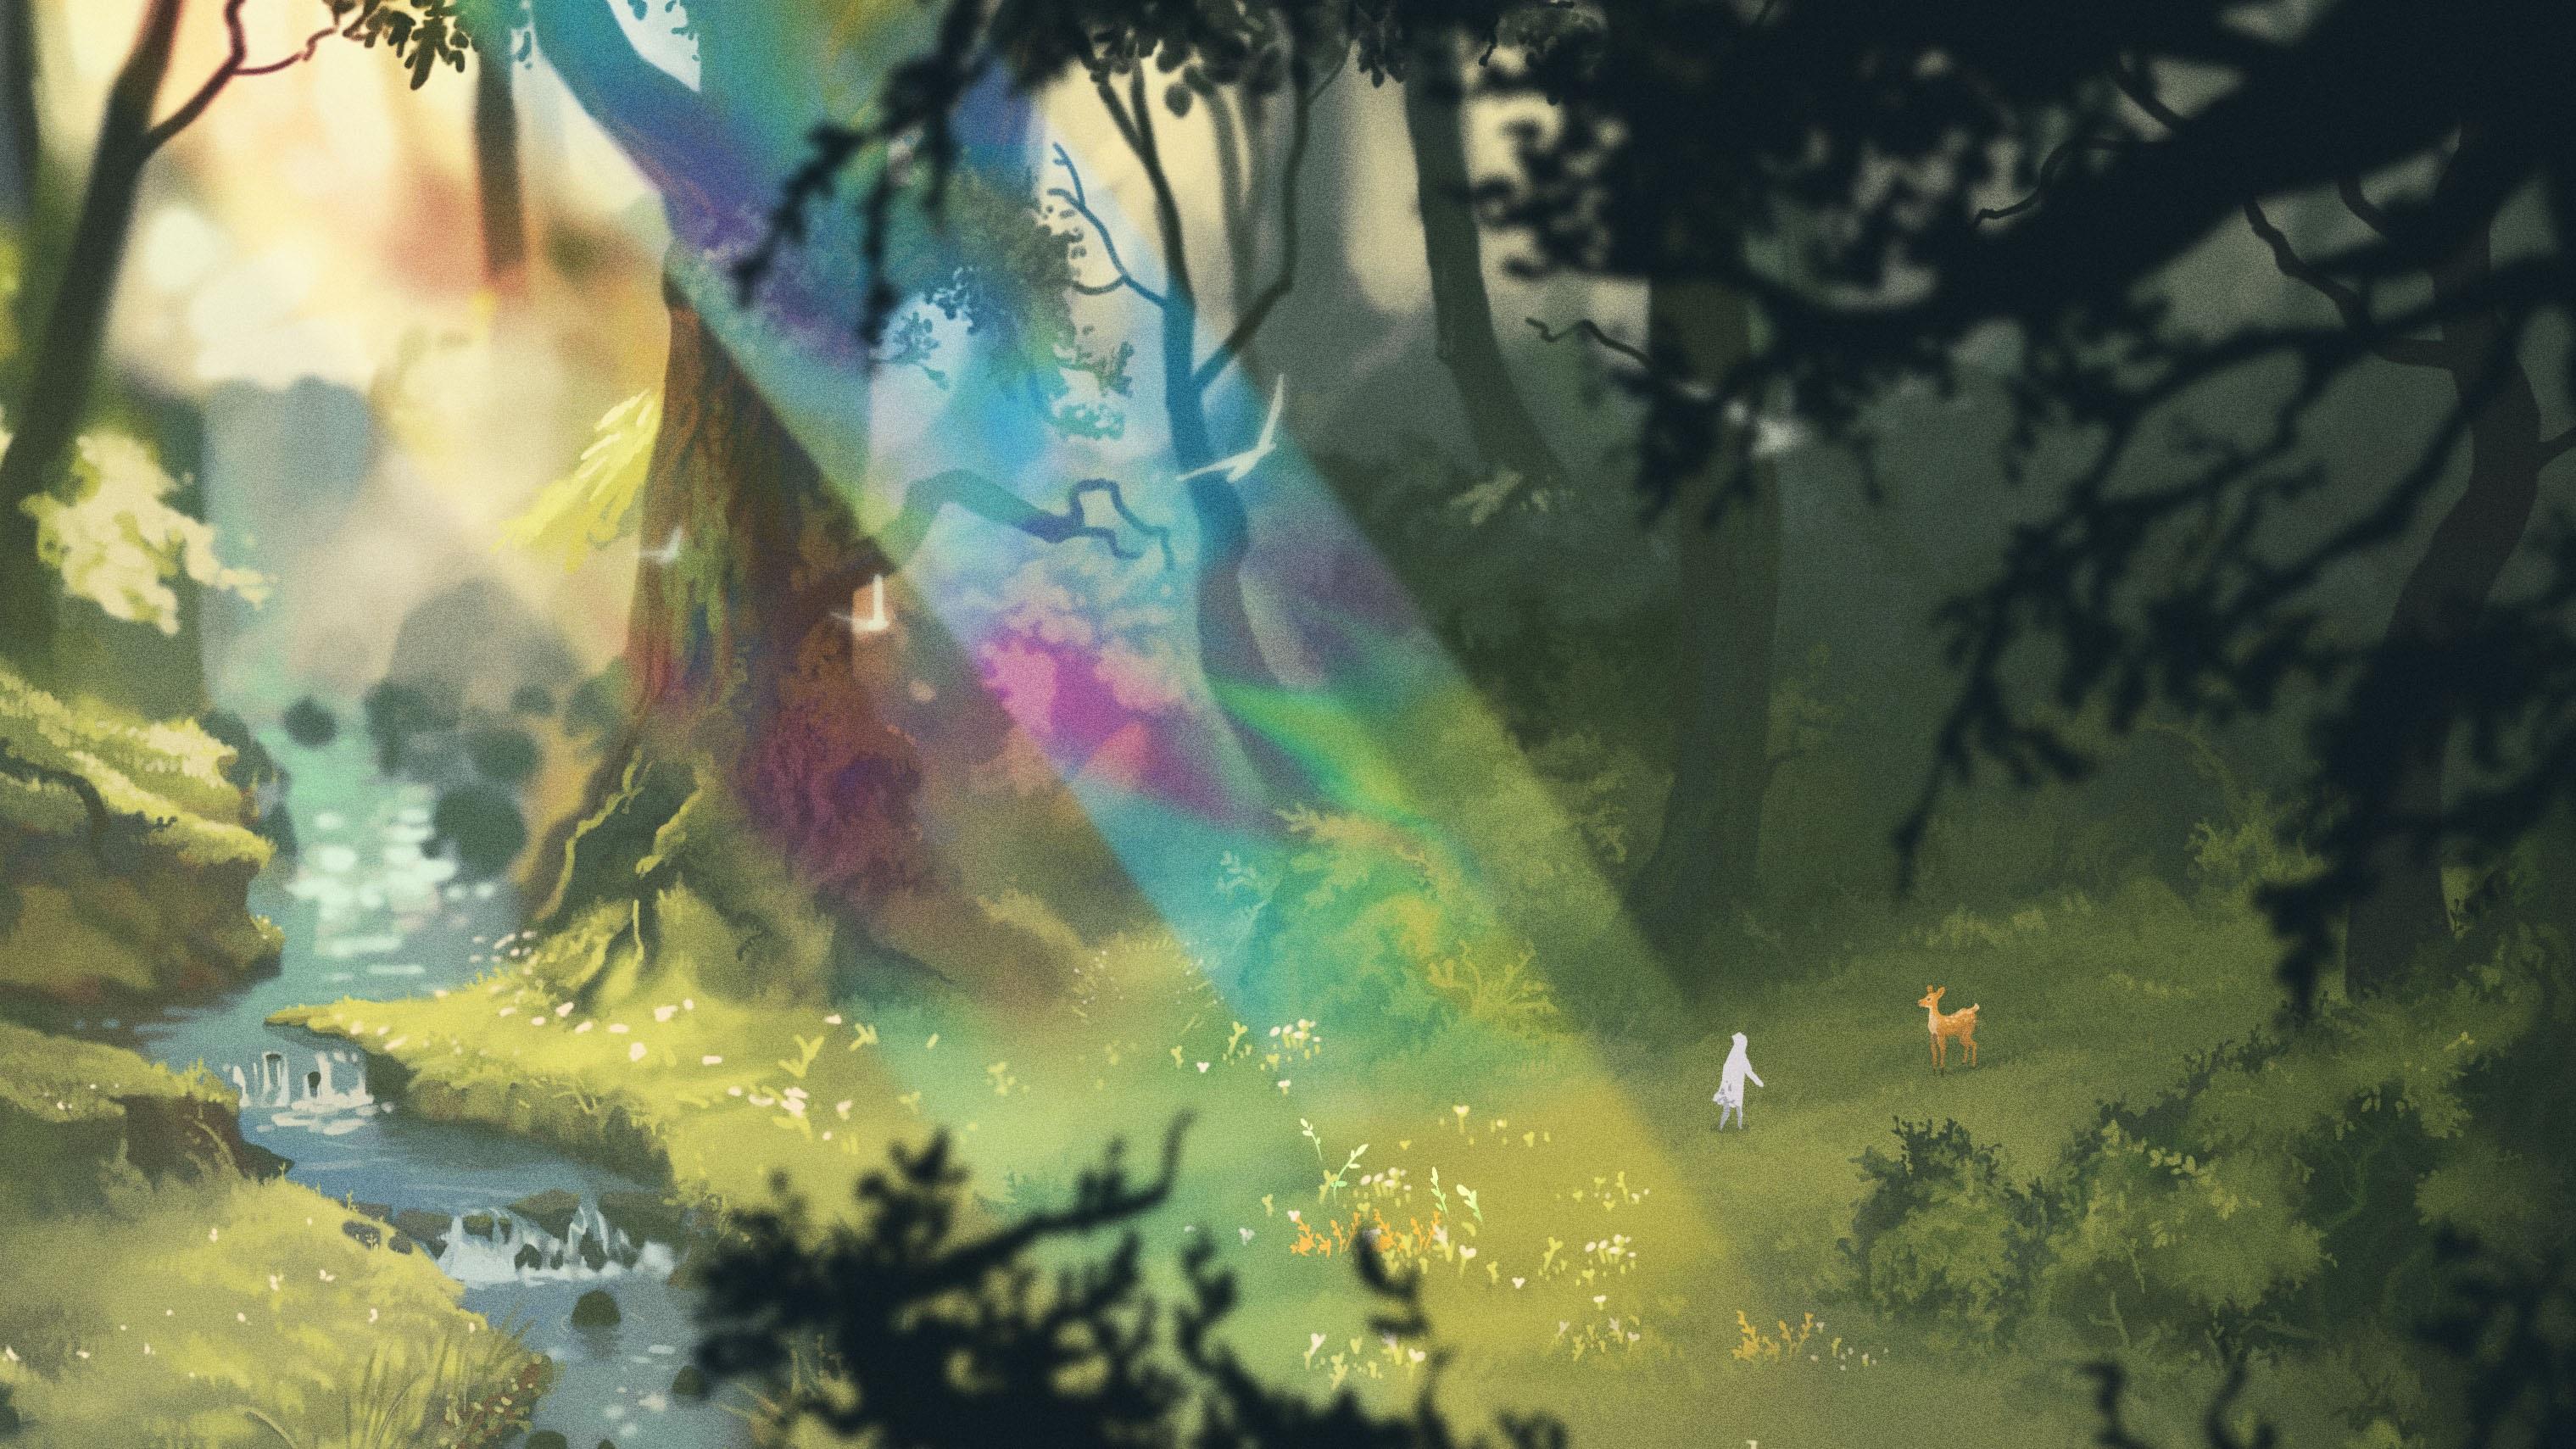 The Wanderer: Frankenstein's Creature - sunlight in a forest